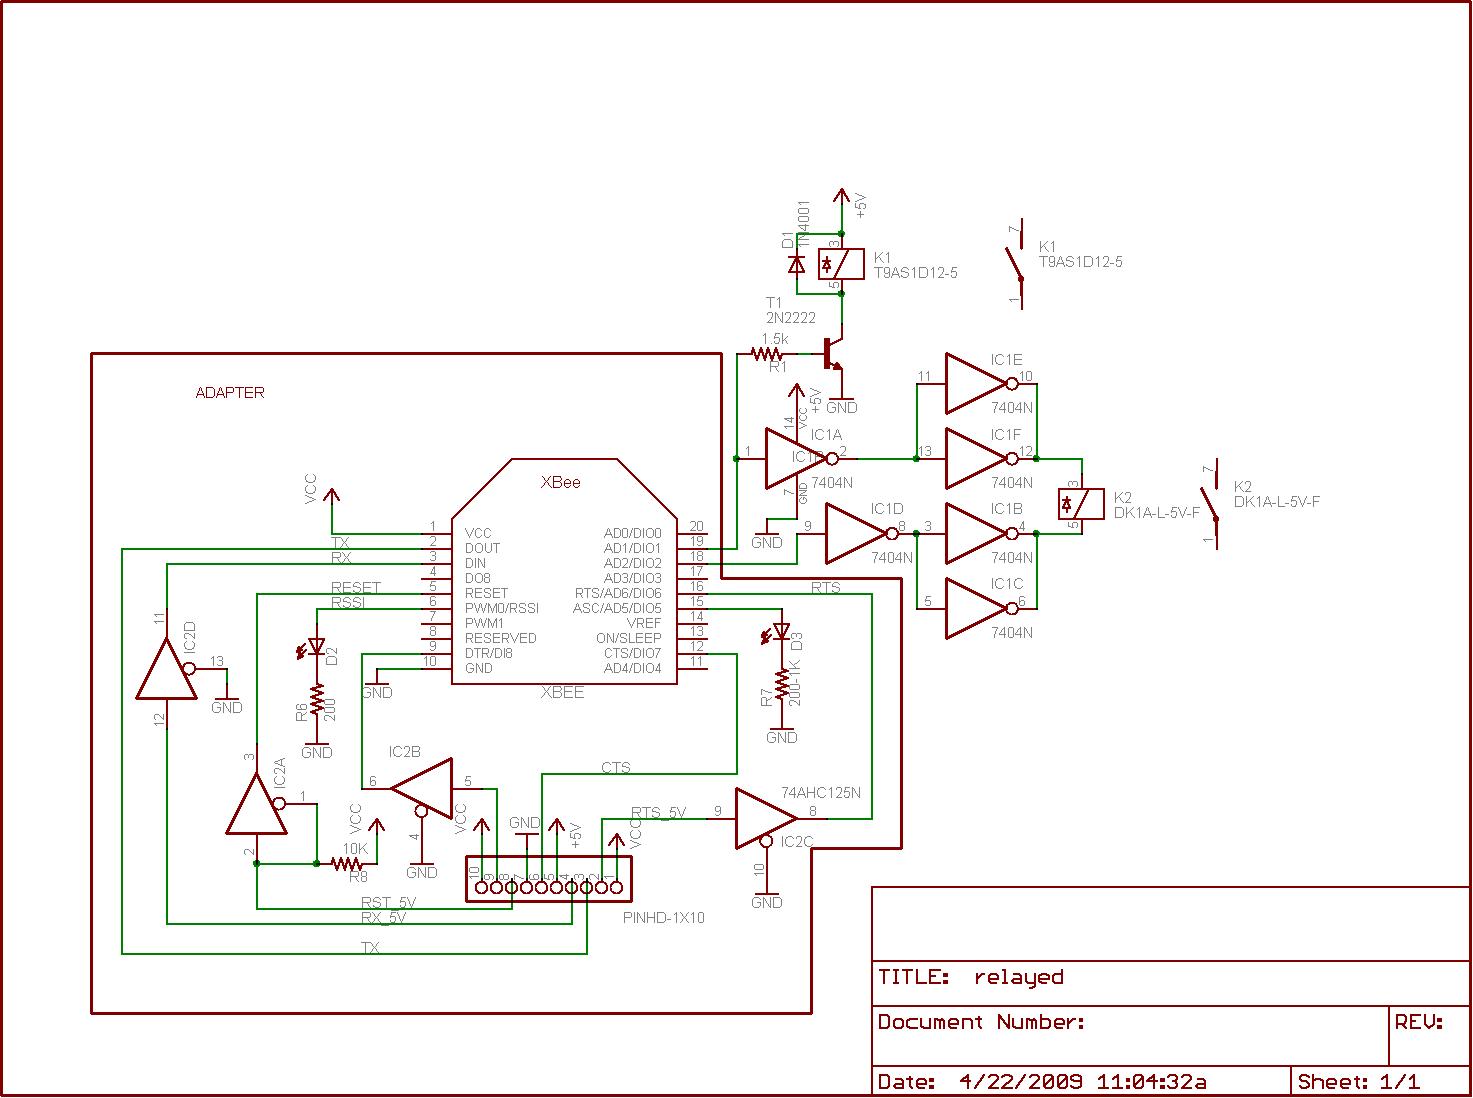 Using Xbees To Control Relays  Adafruit Industries  Makers - Motor control using relay circuit diagram